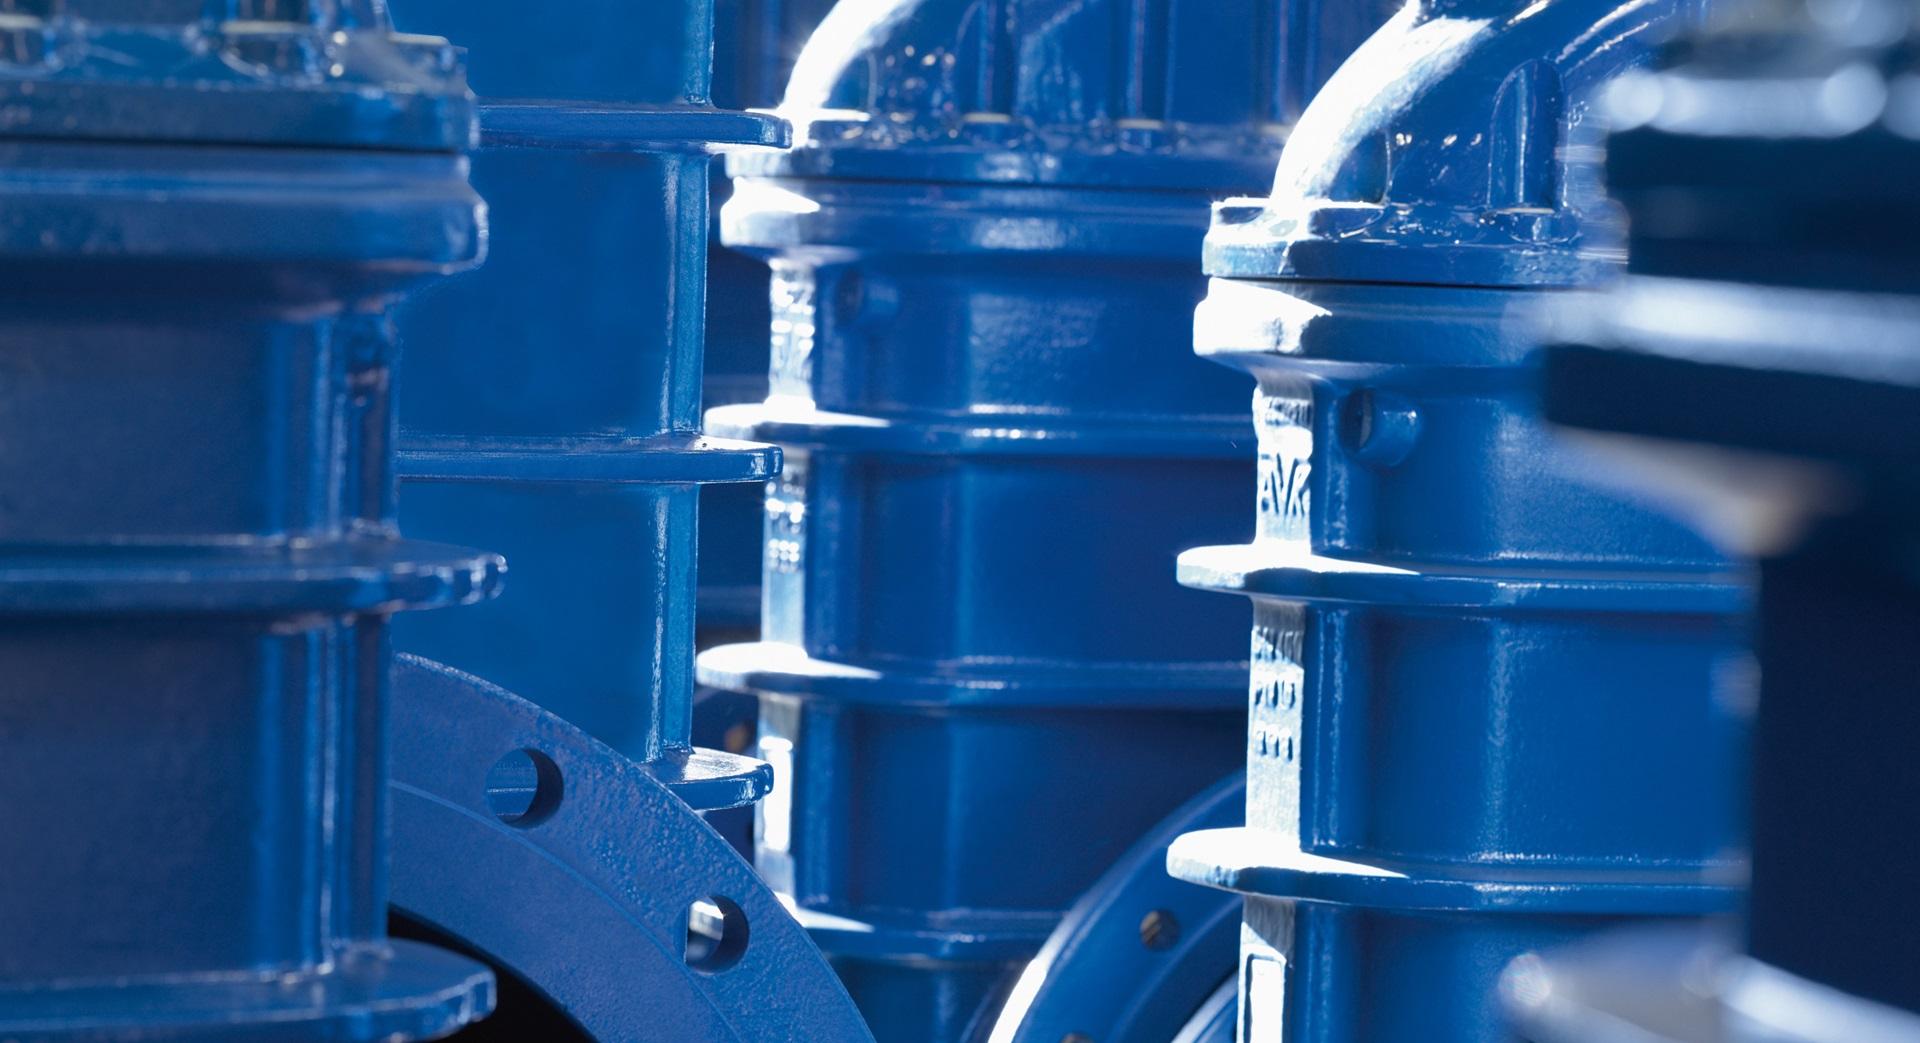 EN 1074 standard for valves for water supply